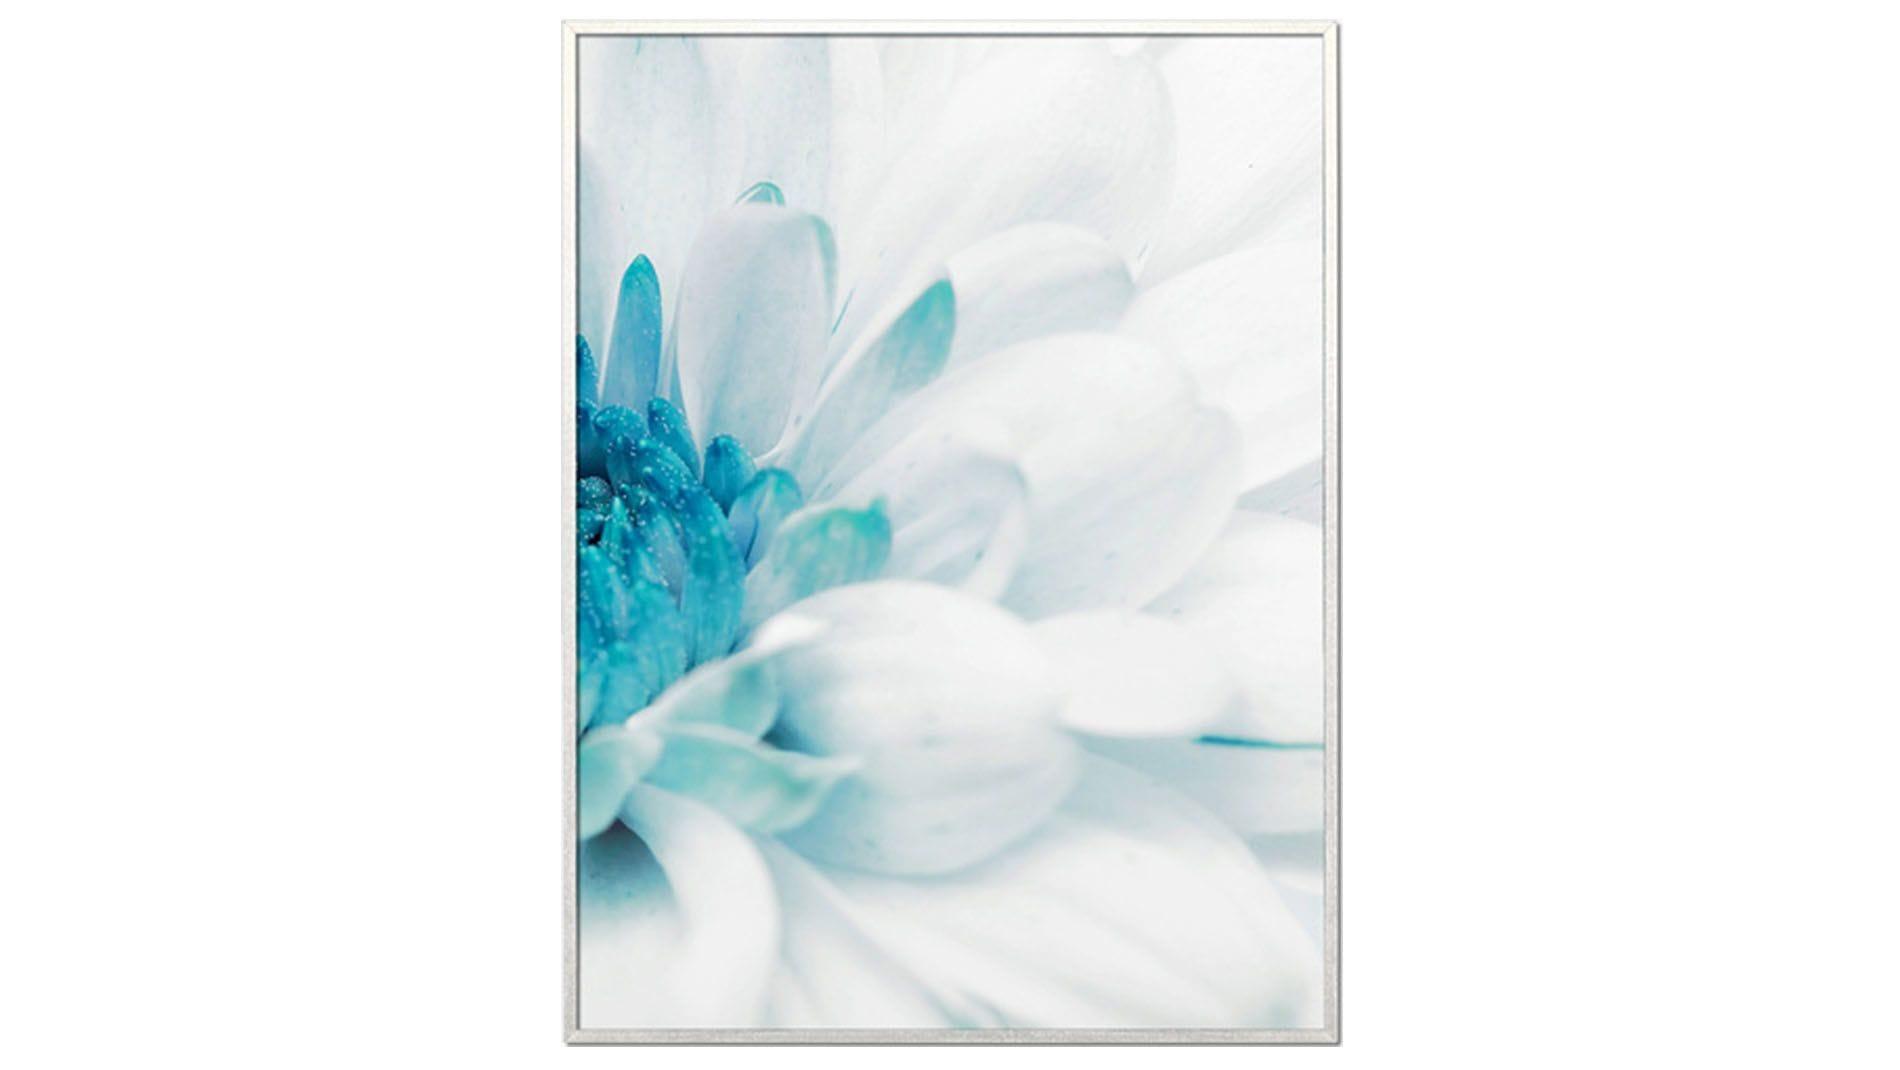 Постер на стену Красивая хризантема-2 60х80см